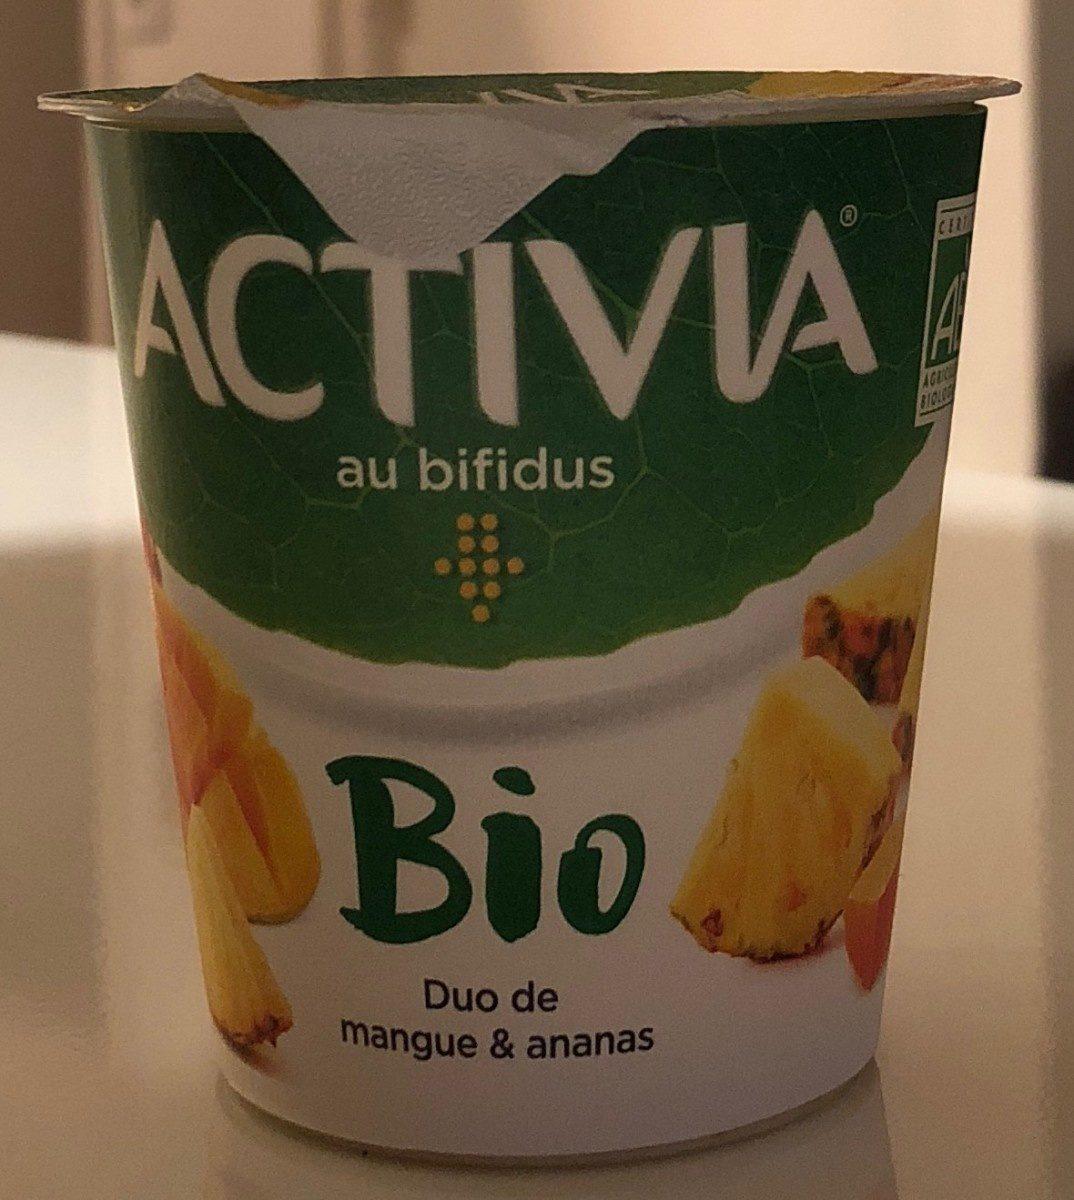 Yaourt Activia Duo mangue ananas - Produit